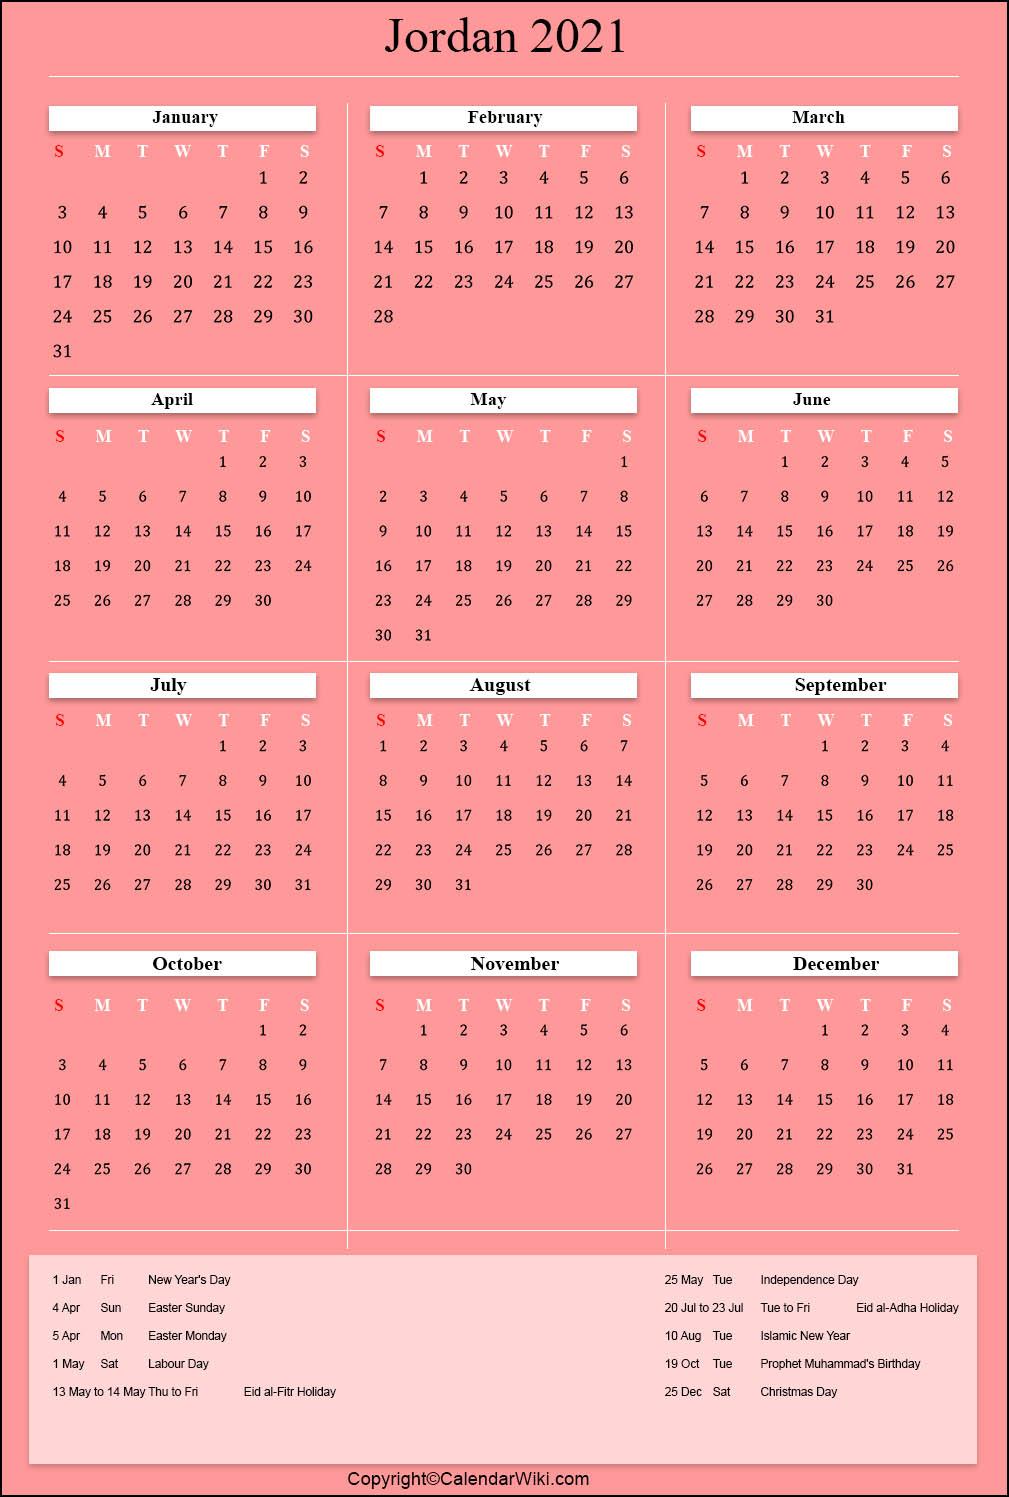 jordan holidays 2021